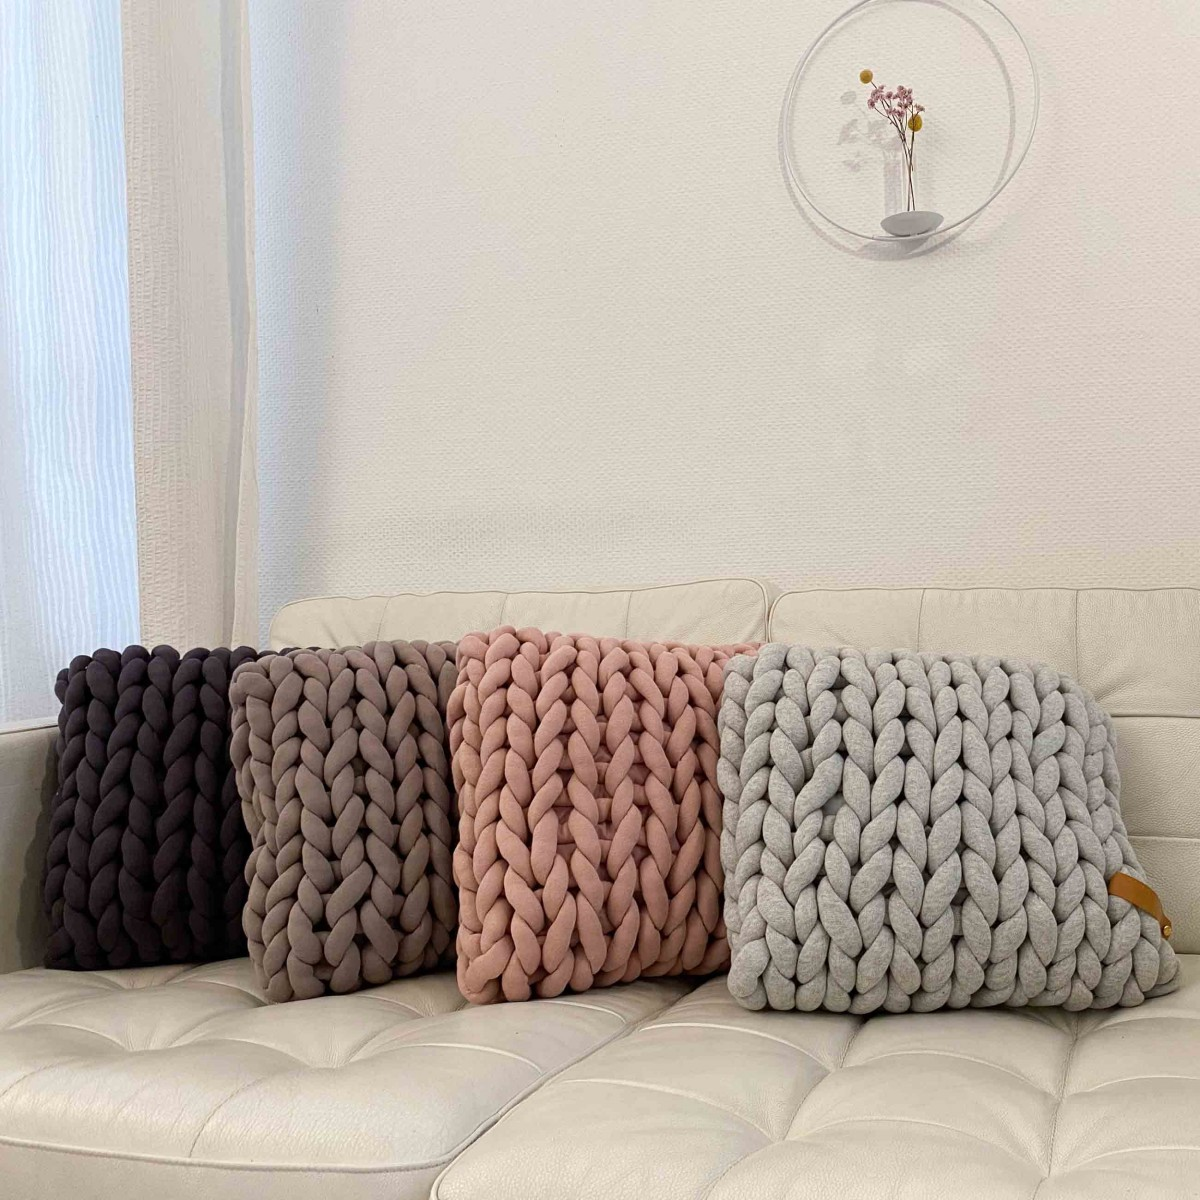 adorist - XXL Grobstrick Cotton Tube Kissen 45x40cm, dunkelgrau